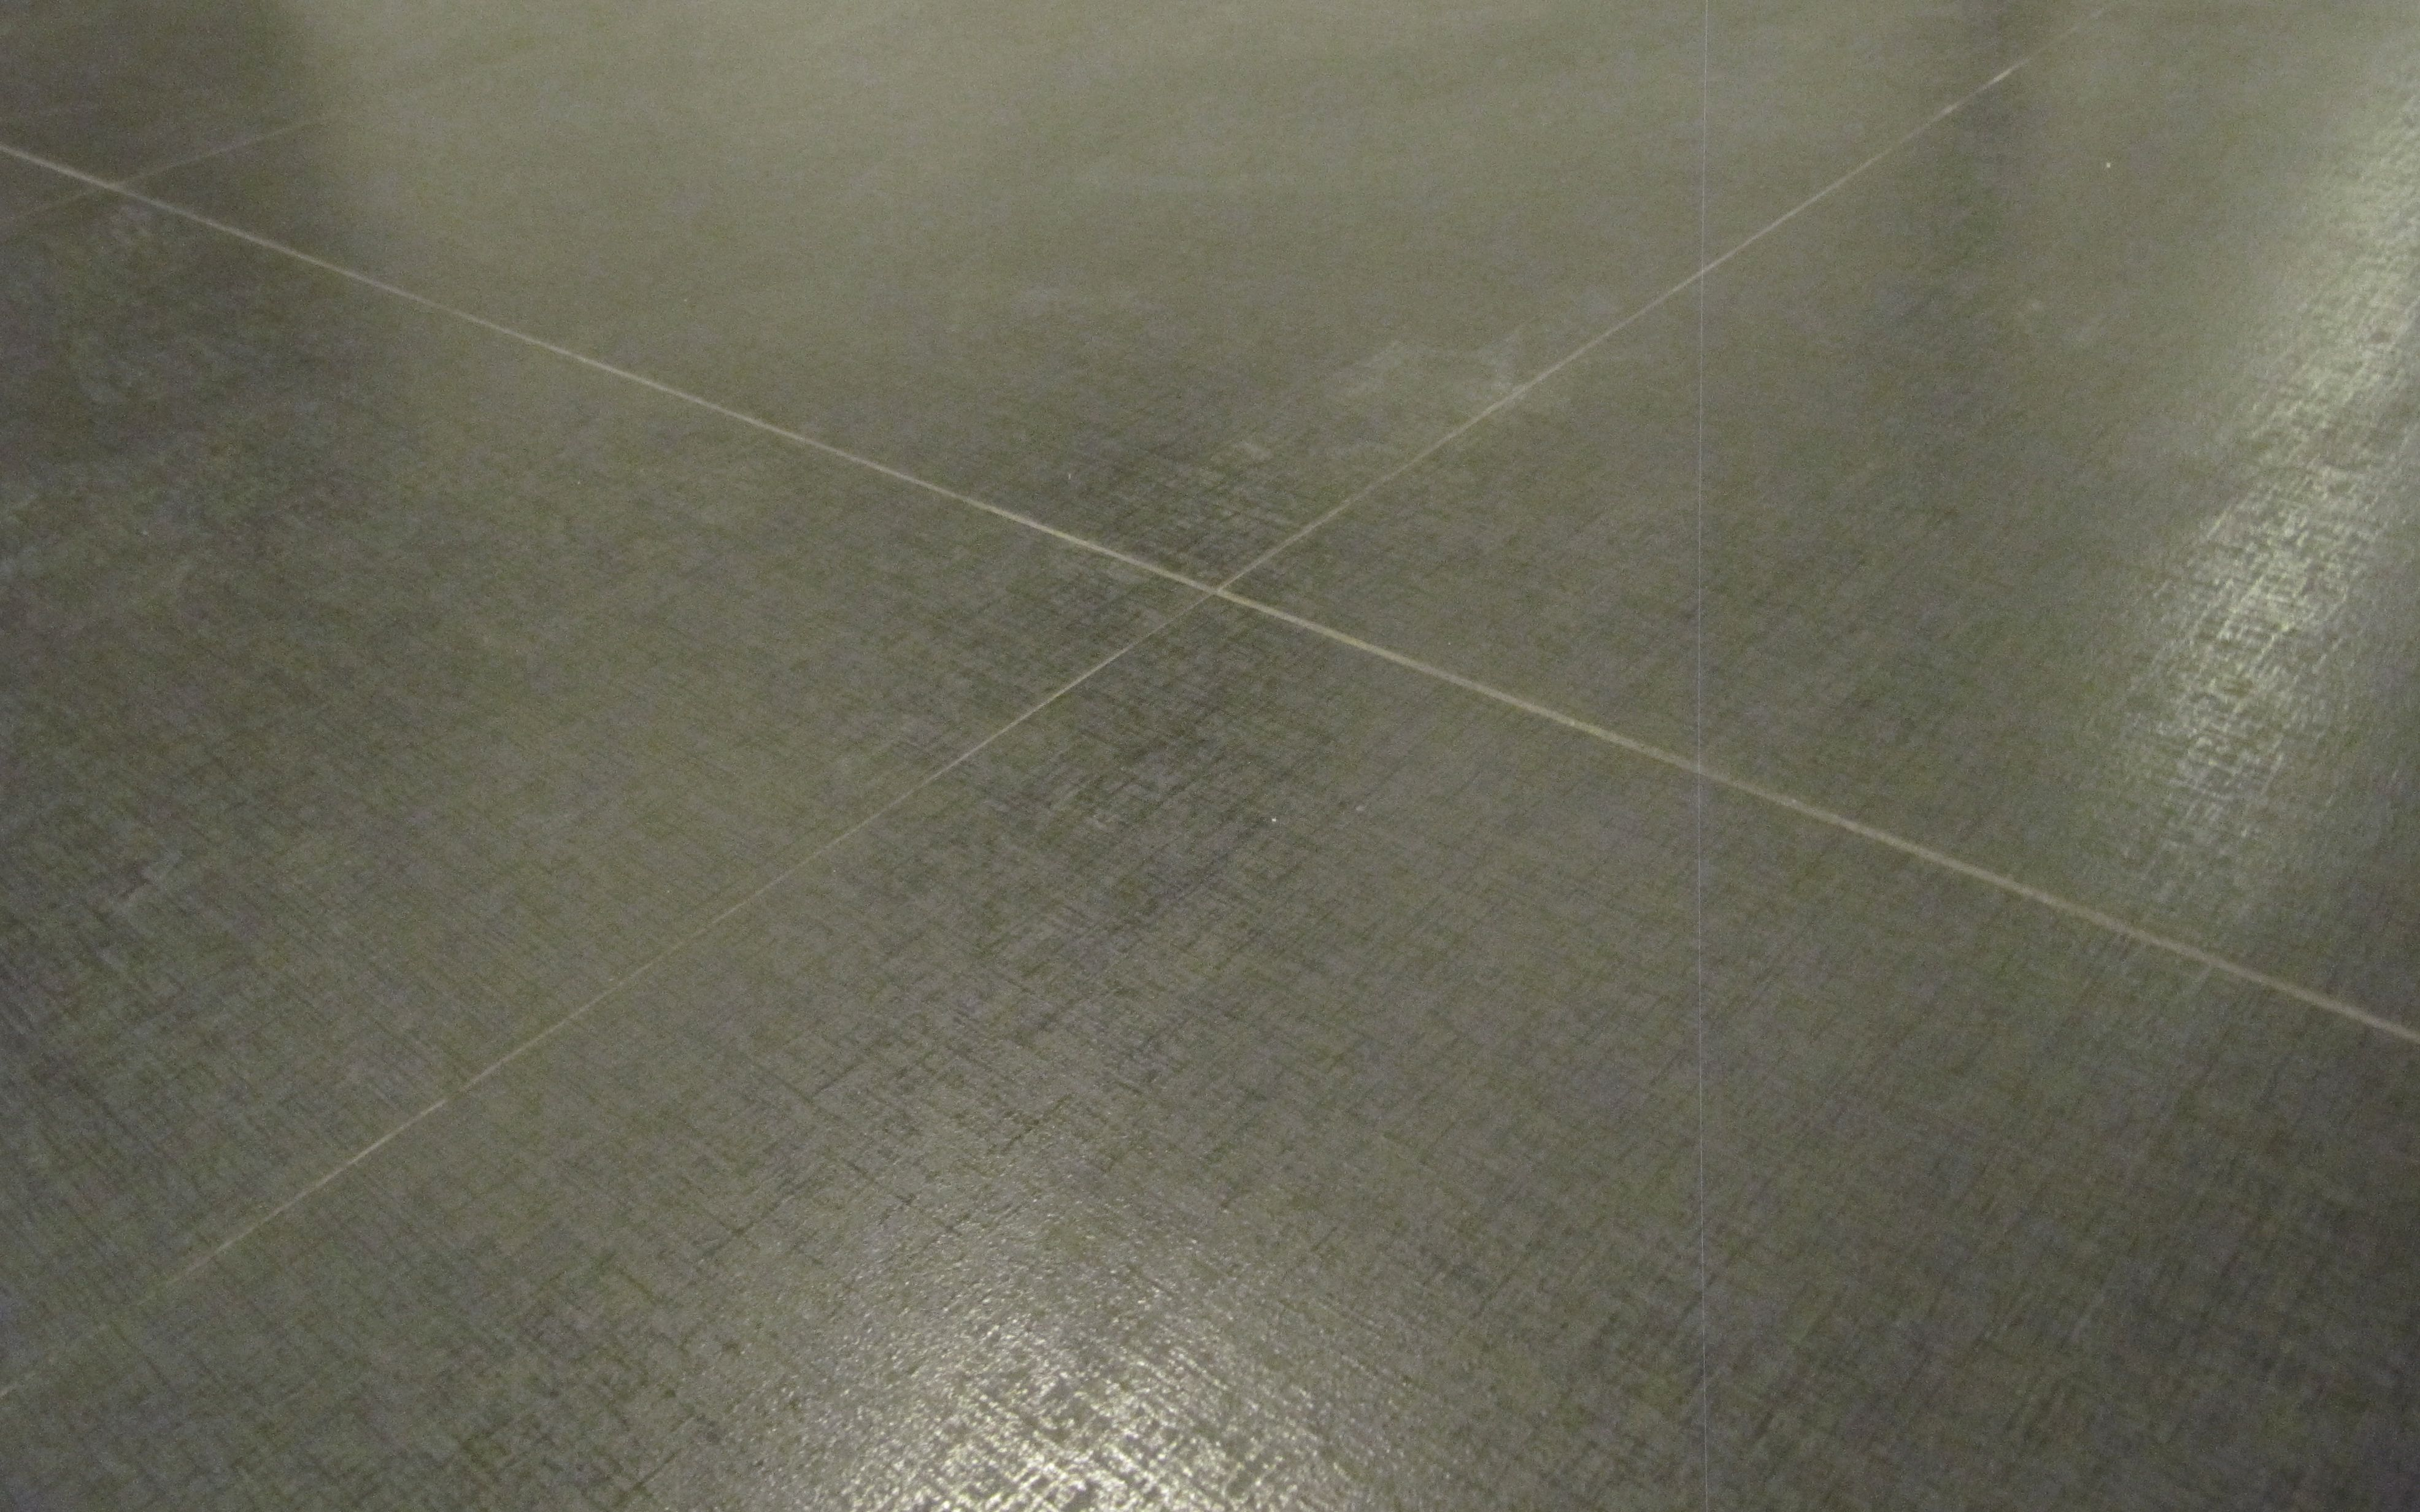 X 24 Tile Select Crema Marfil 24x24 Polished Marble Tile E